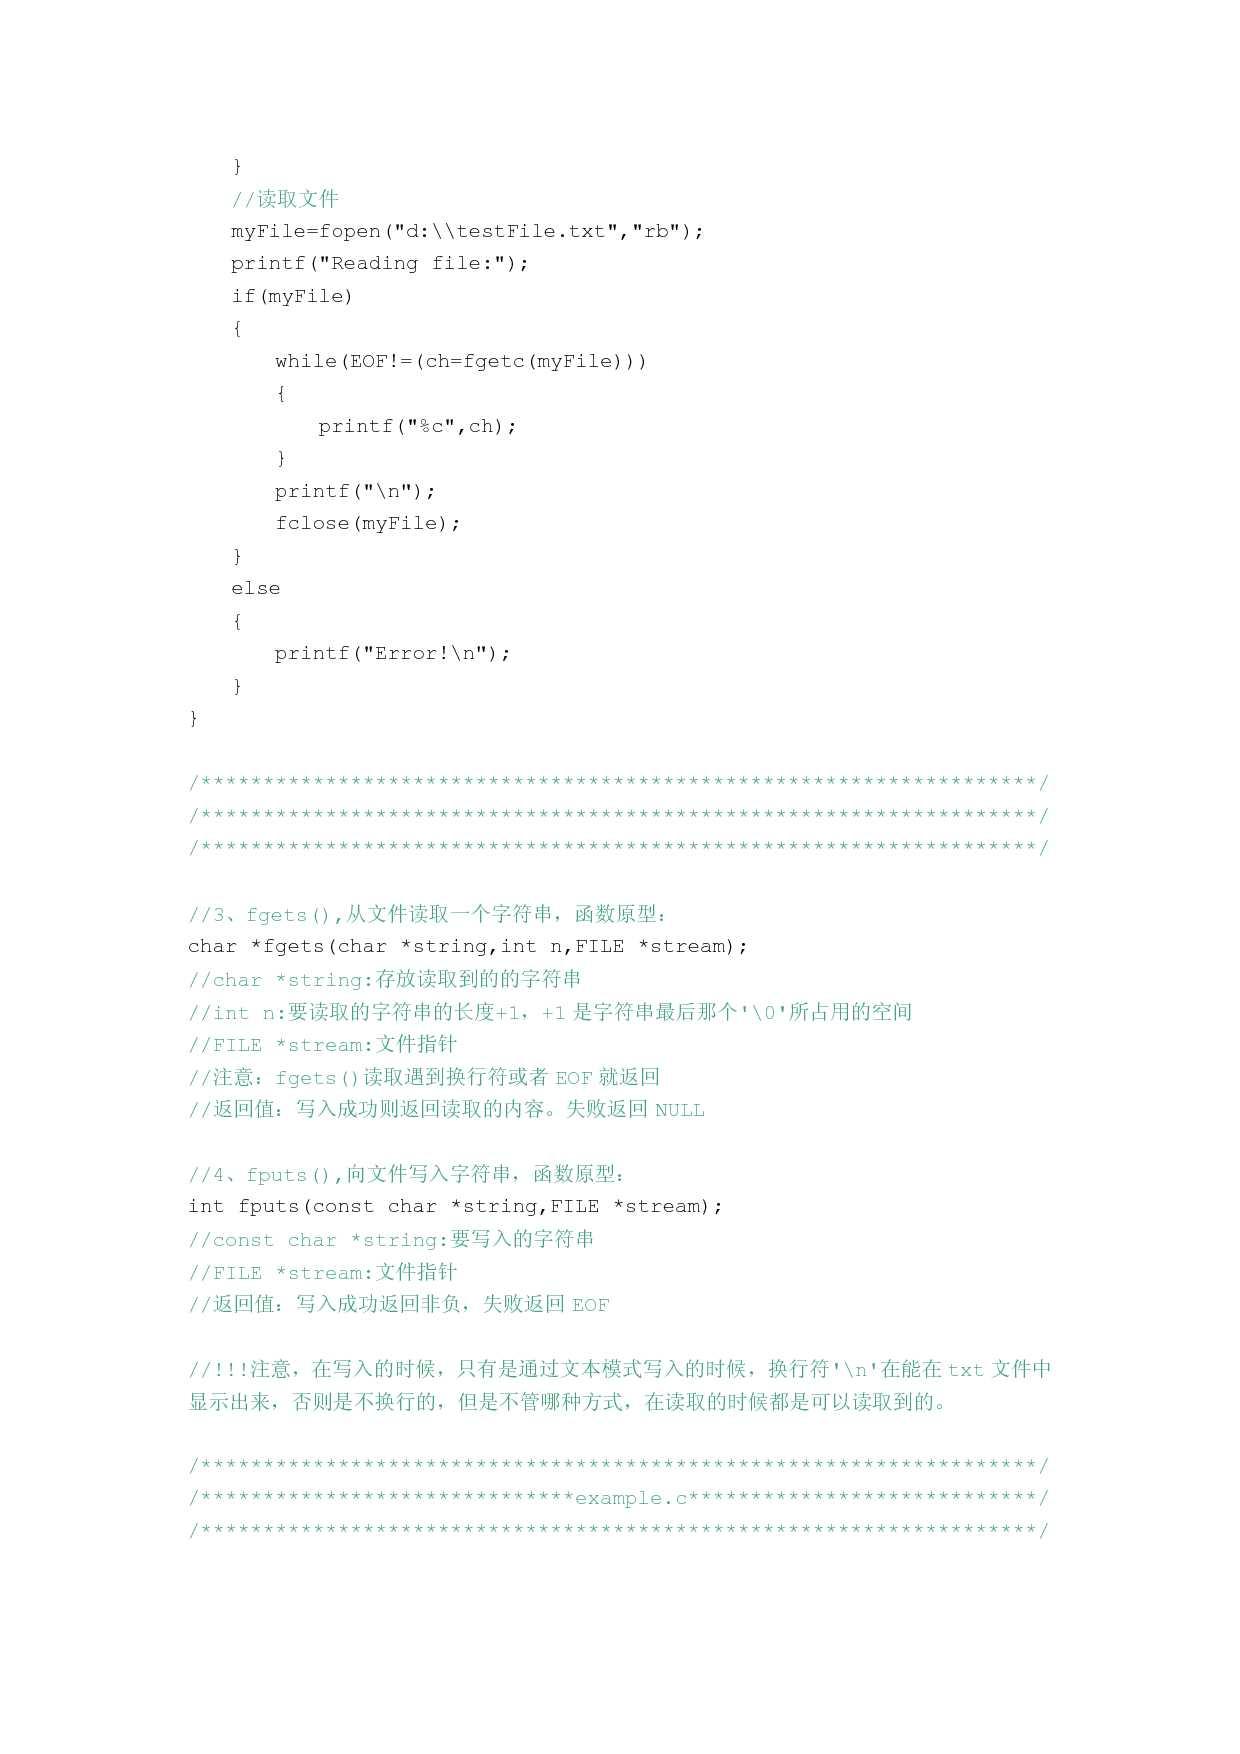 C文件中对语言的操作by秦二呆2018成绩招教市值图片